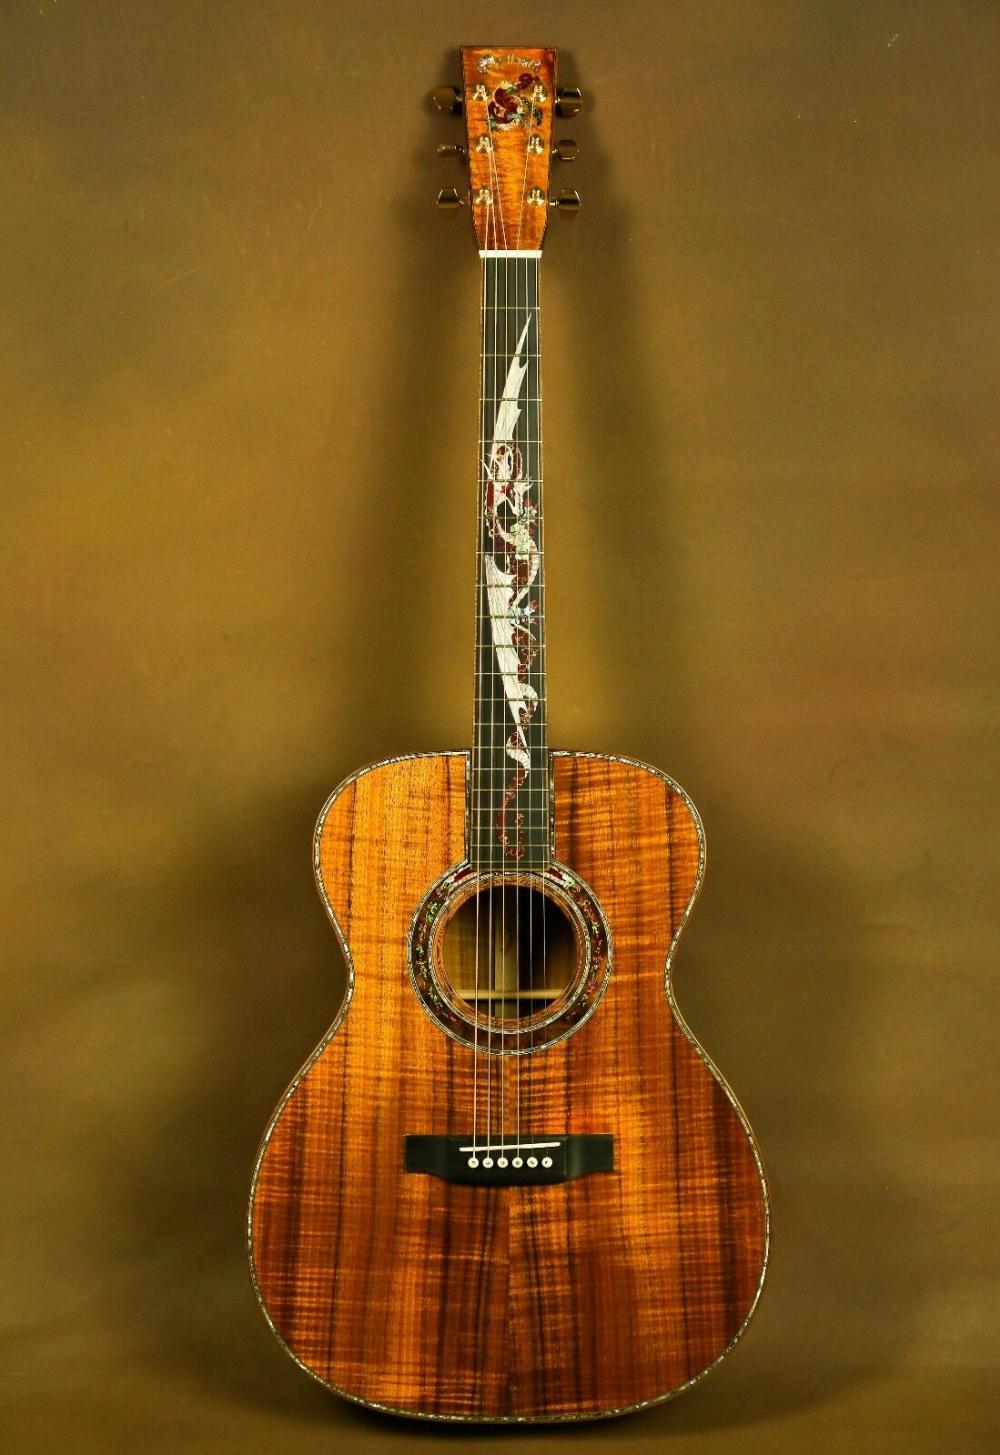 Martin Om 45 Dragon Koa Custom Acoustic Guitar Ebay In 2021 Custom Acoustic Guitars Martin Acoustic Guitar Martin Guitar